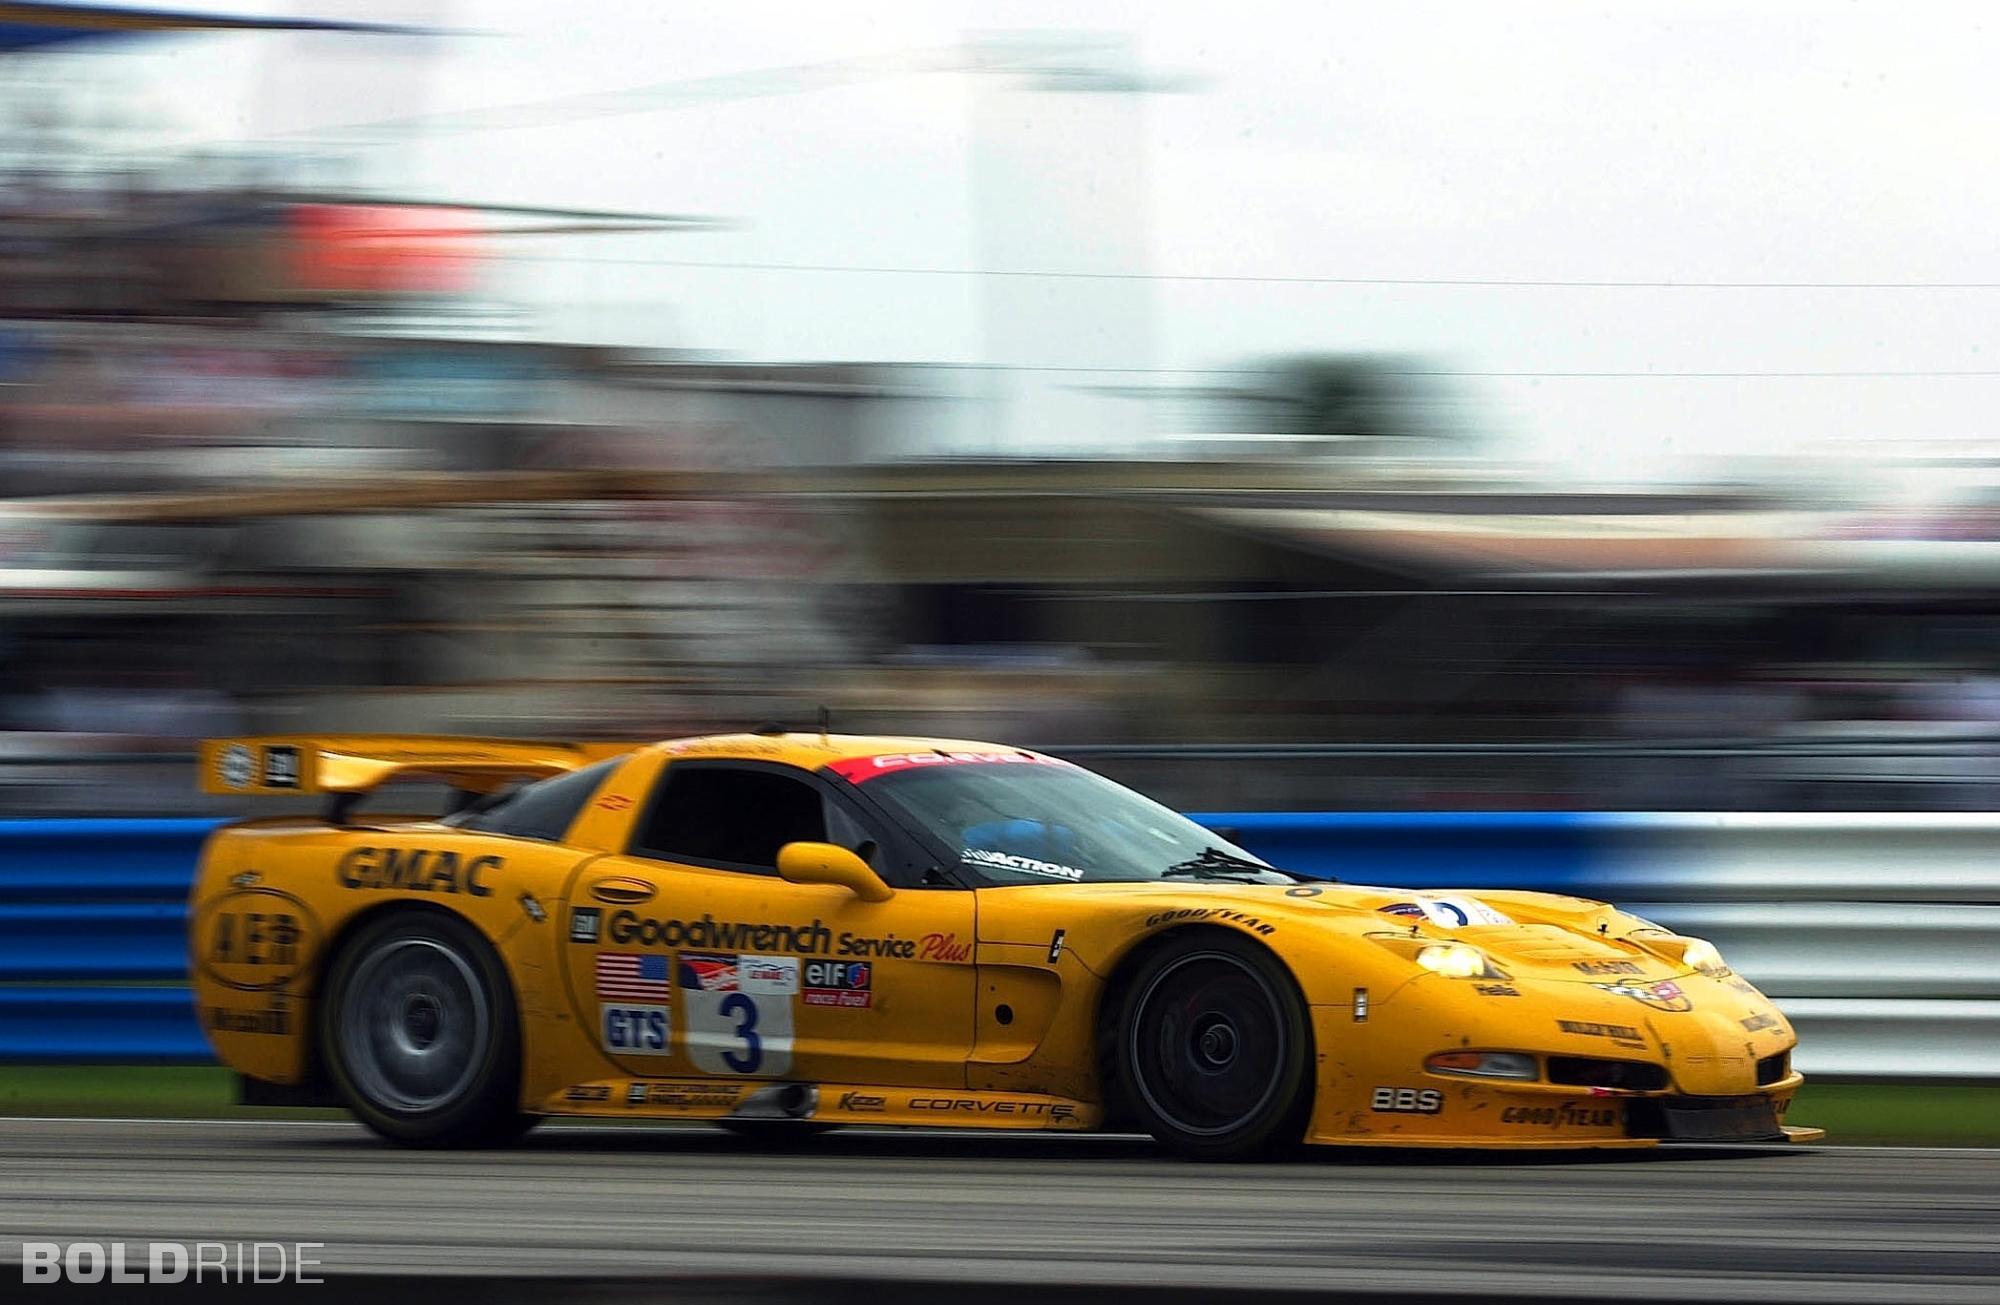 Corvette C5 R supercar supercars race racing g wallpaper background 2000x1305